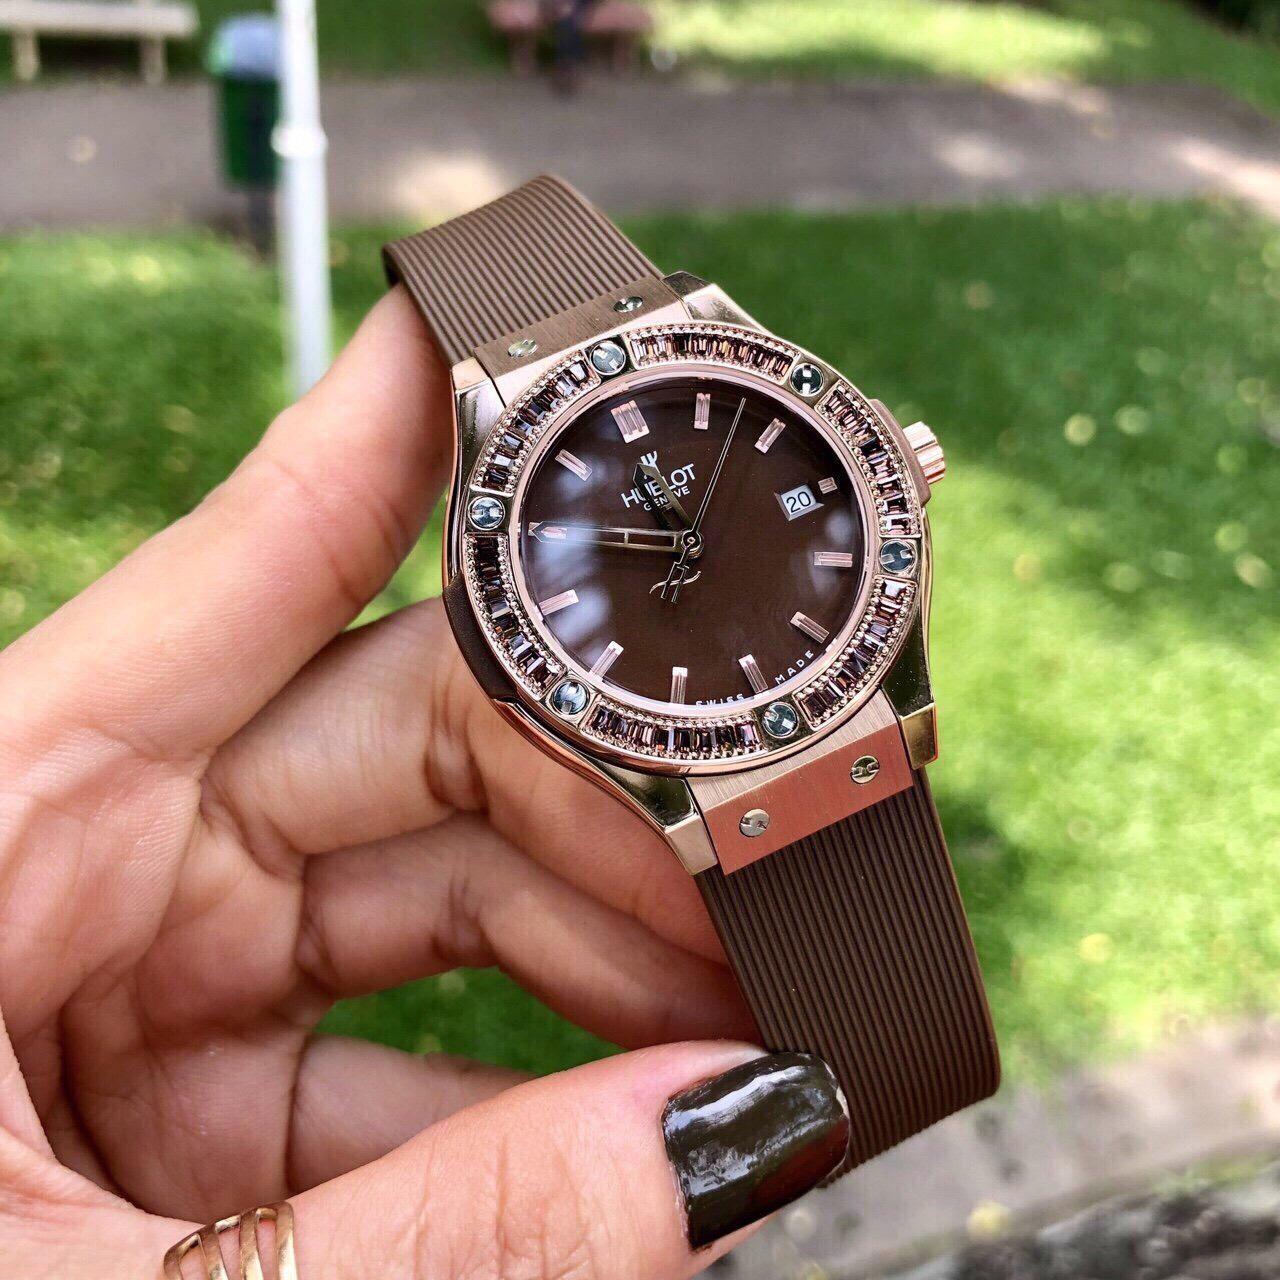 Nơi bán Đồng Hồ Nữ Hublot Diamond FS0017